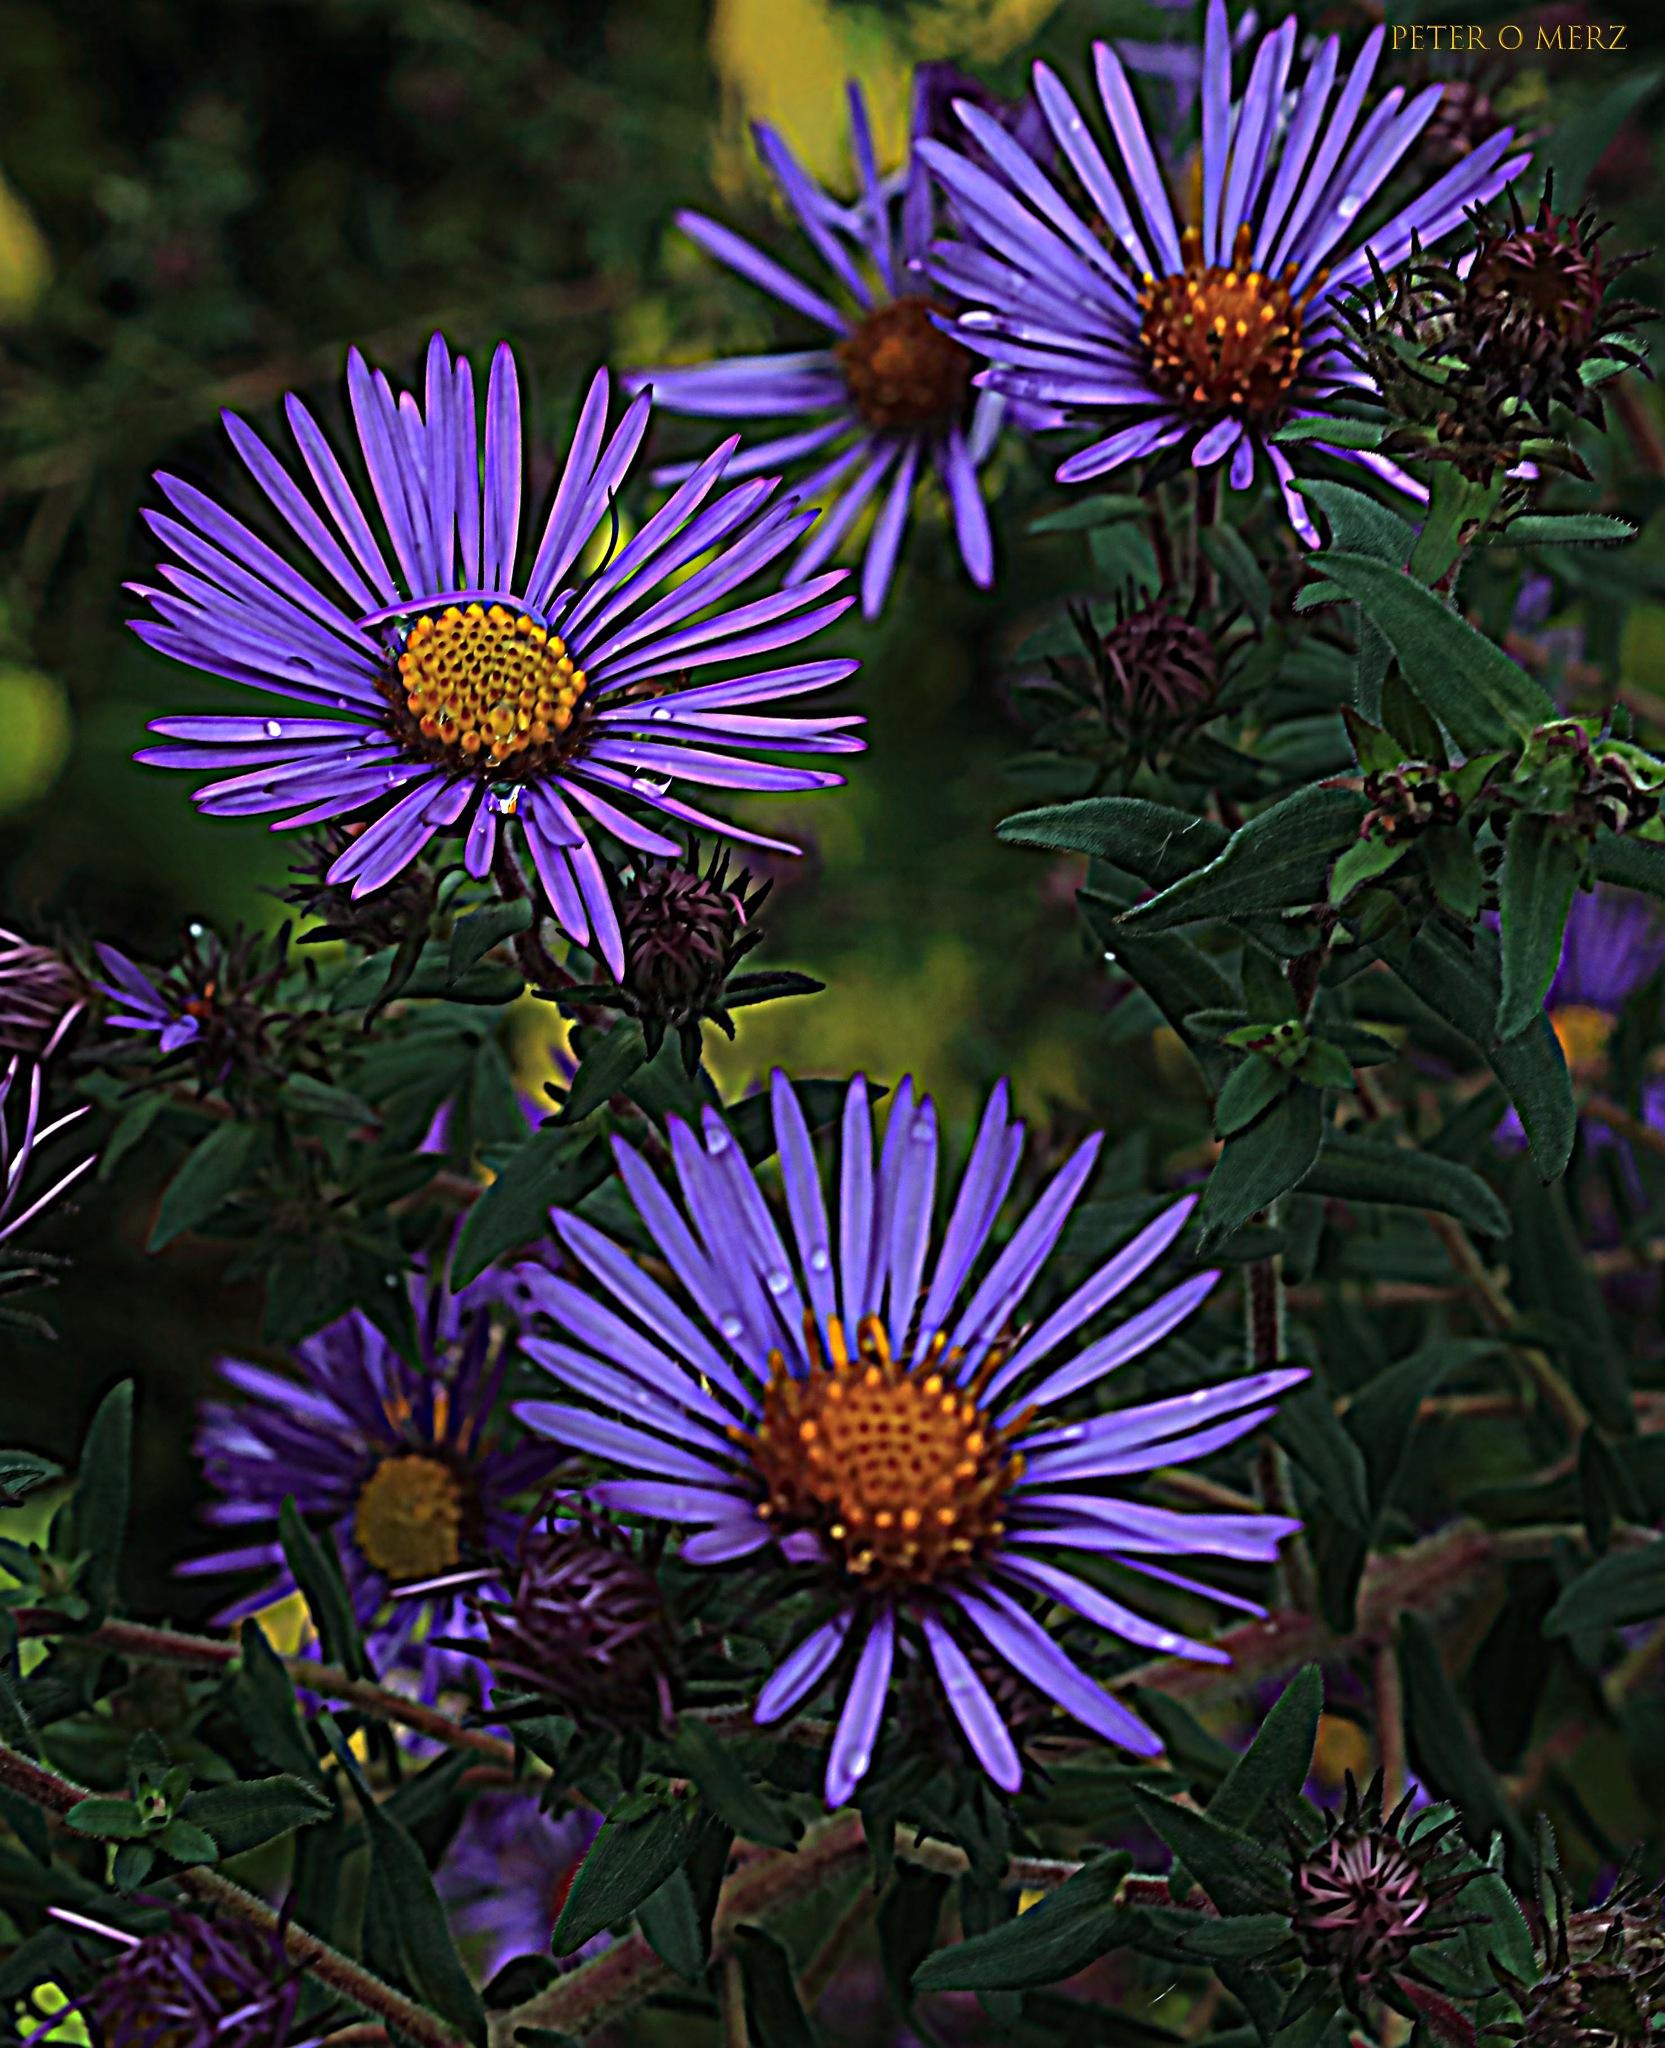 purple beauties by Peter O Merz